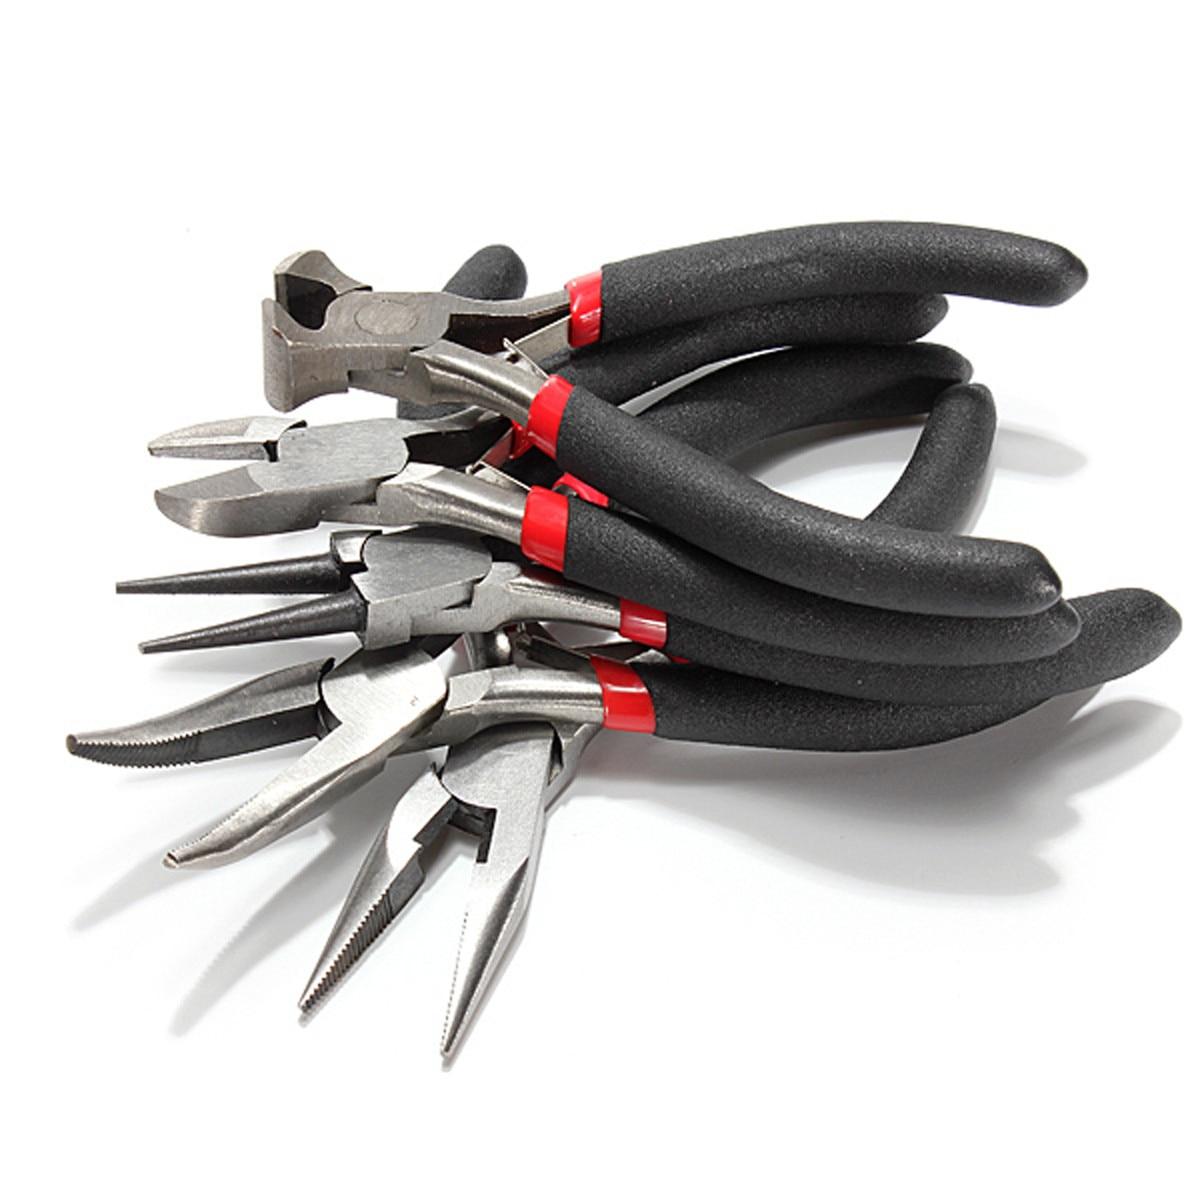 5Pcs Cutter Jewellery Mini Pliers Set Kit Chain Round Bent Needle Nose Beading Making Repair Tool Kit Hand Tools